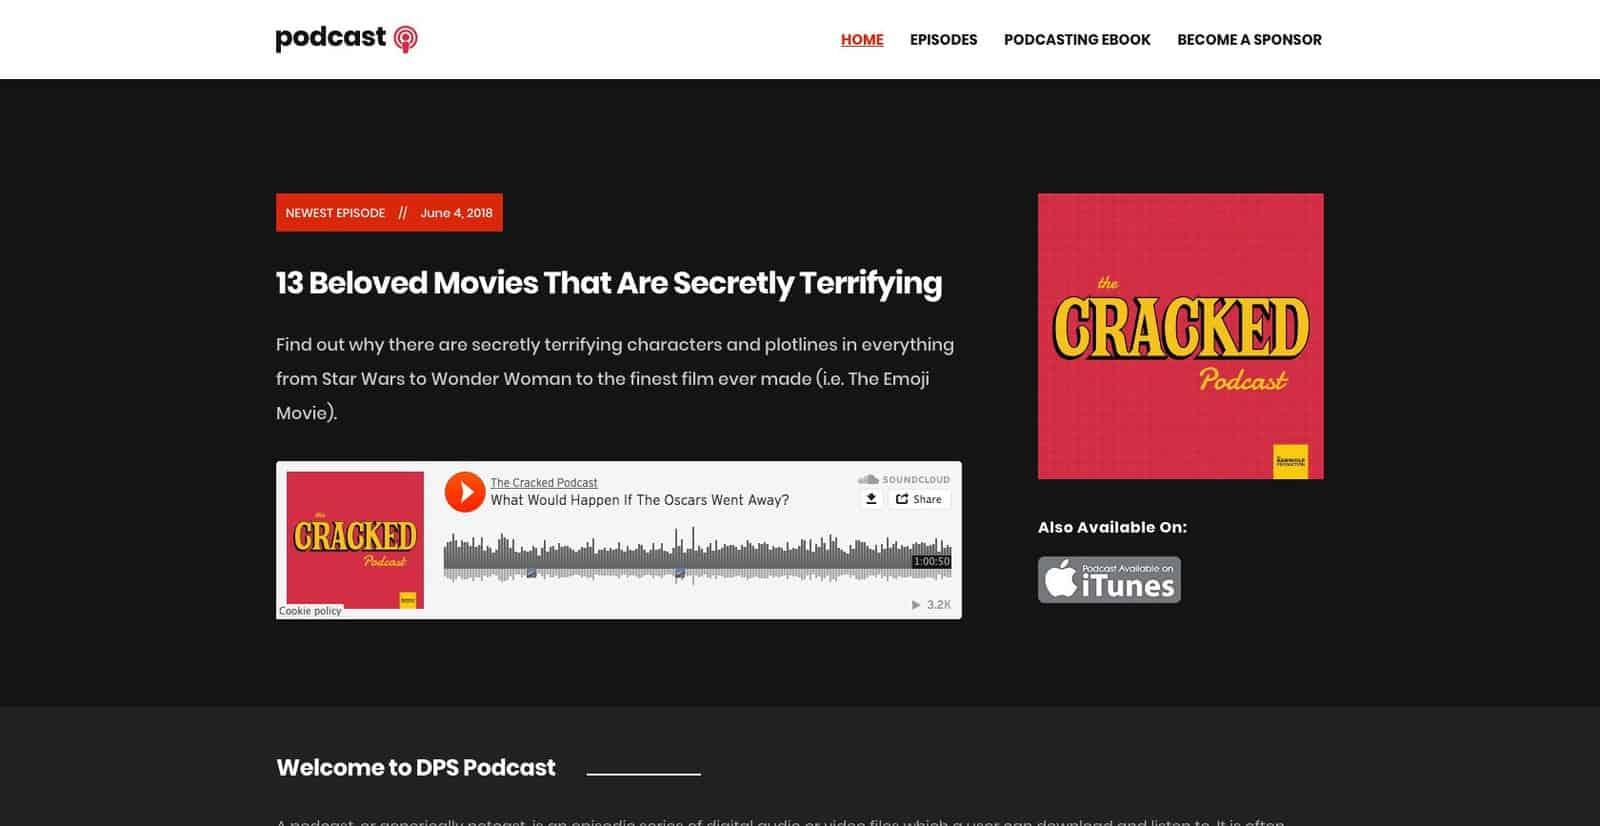 Podcast theme